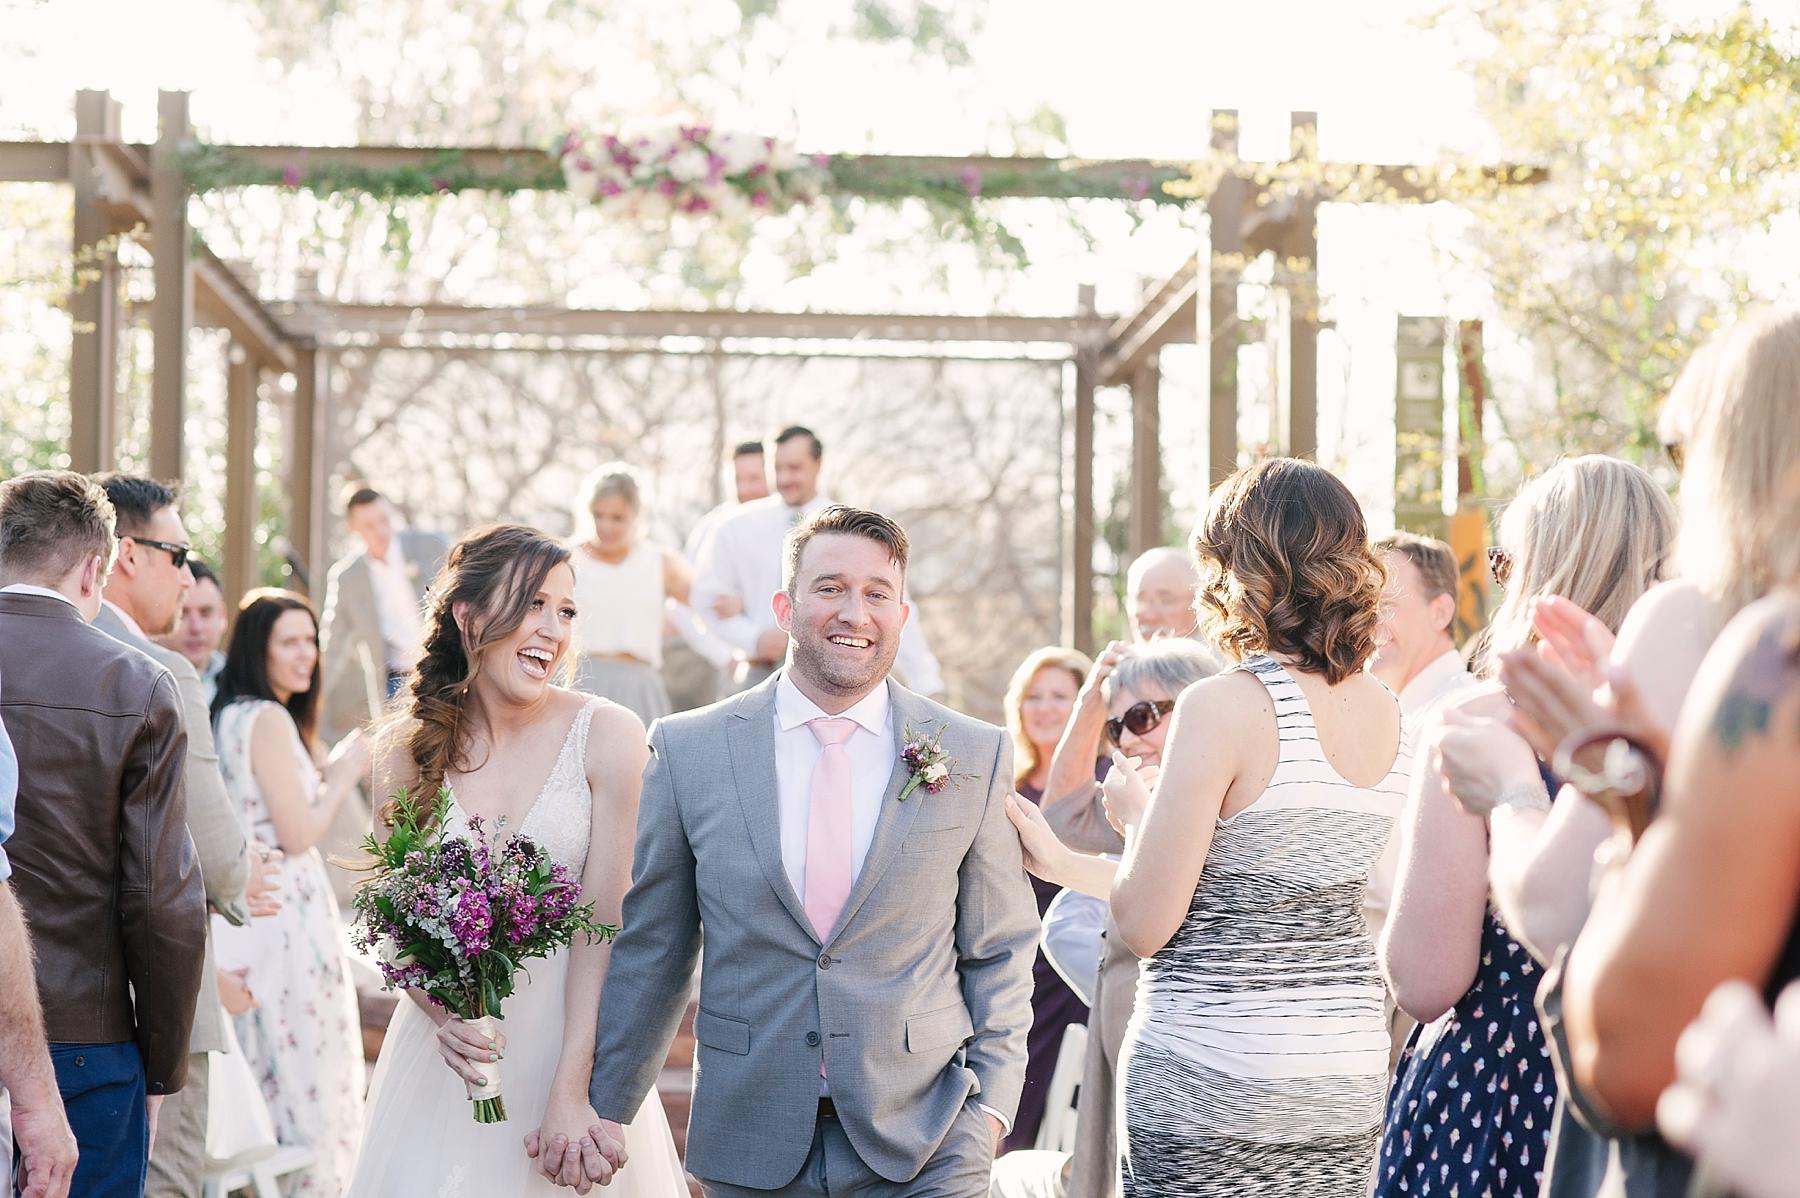 springs-preserve-wedding-las-vegas-destination-photography-the-emerics-29.jpg